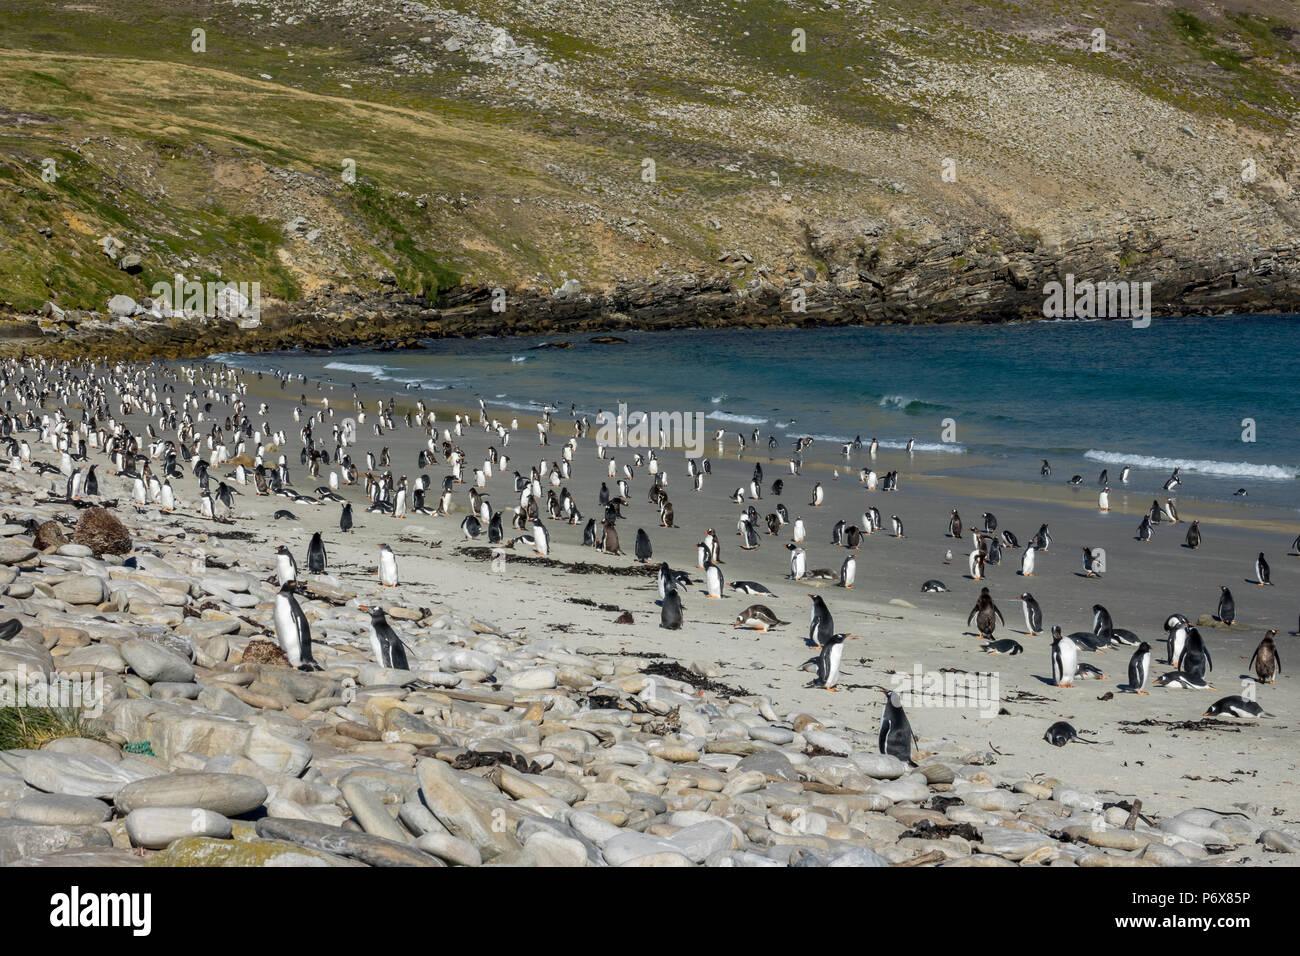 Gentoo penguin colony at Grave Cove, West Falkland, Falkland Islands Stock Photo